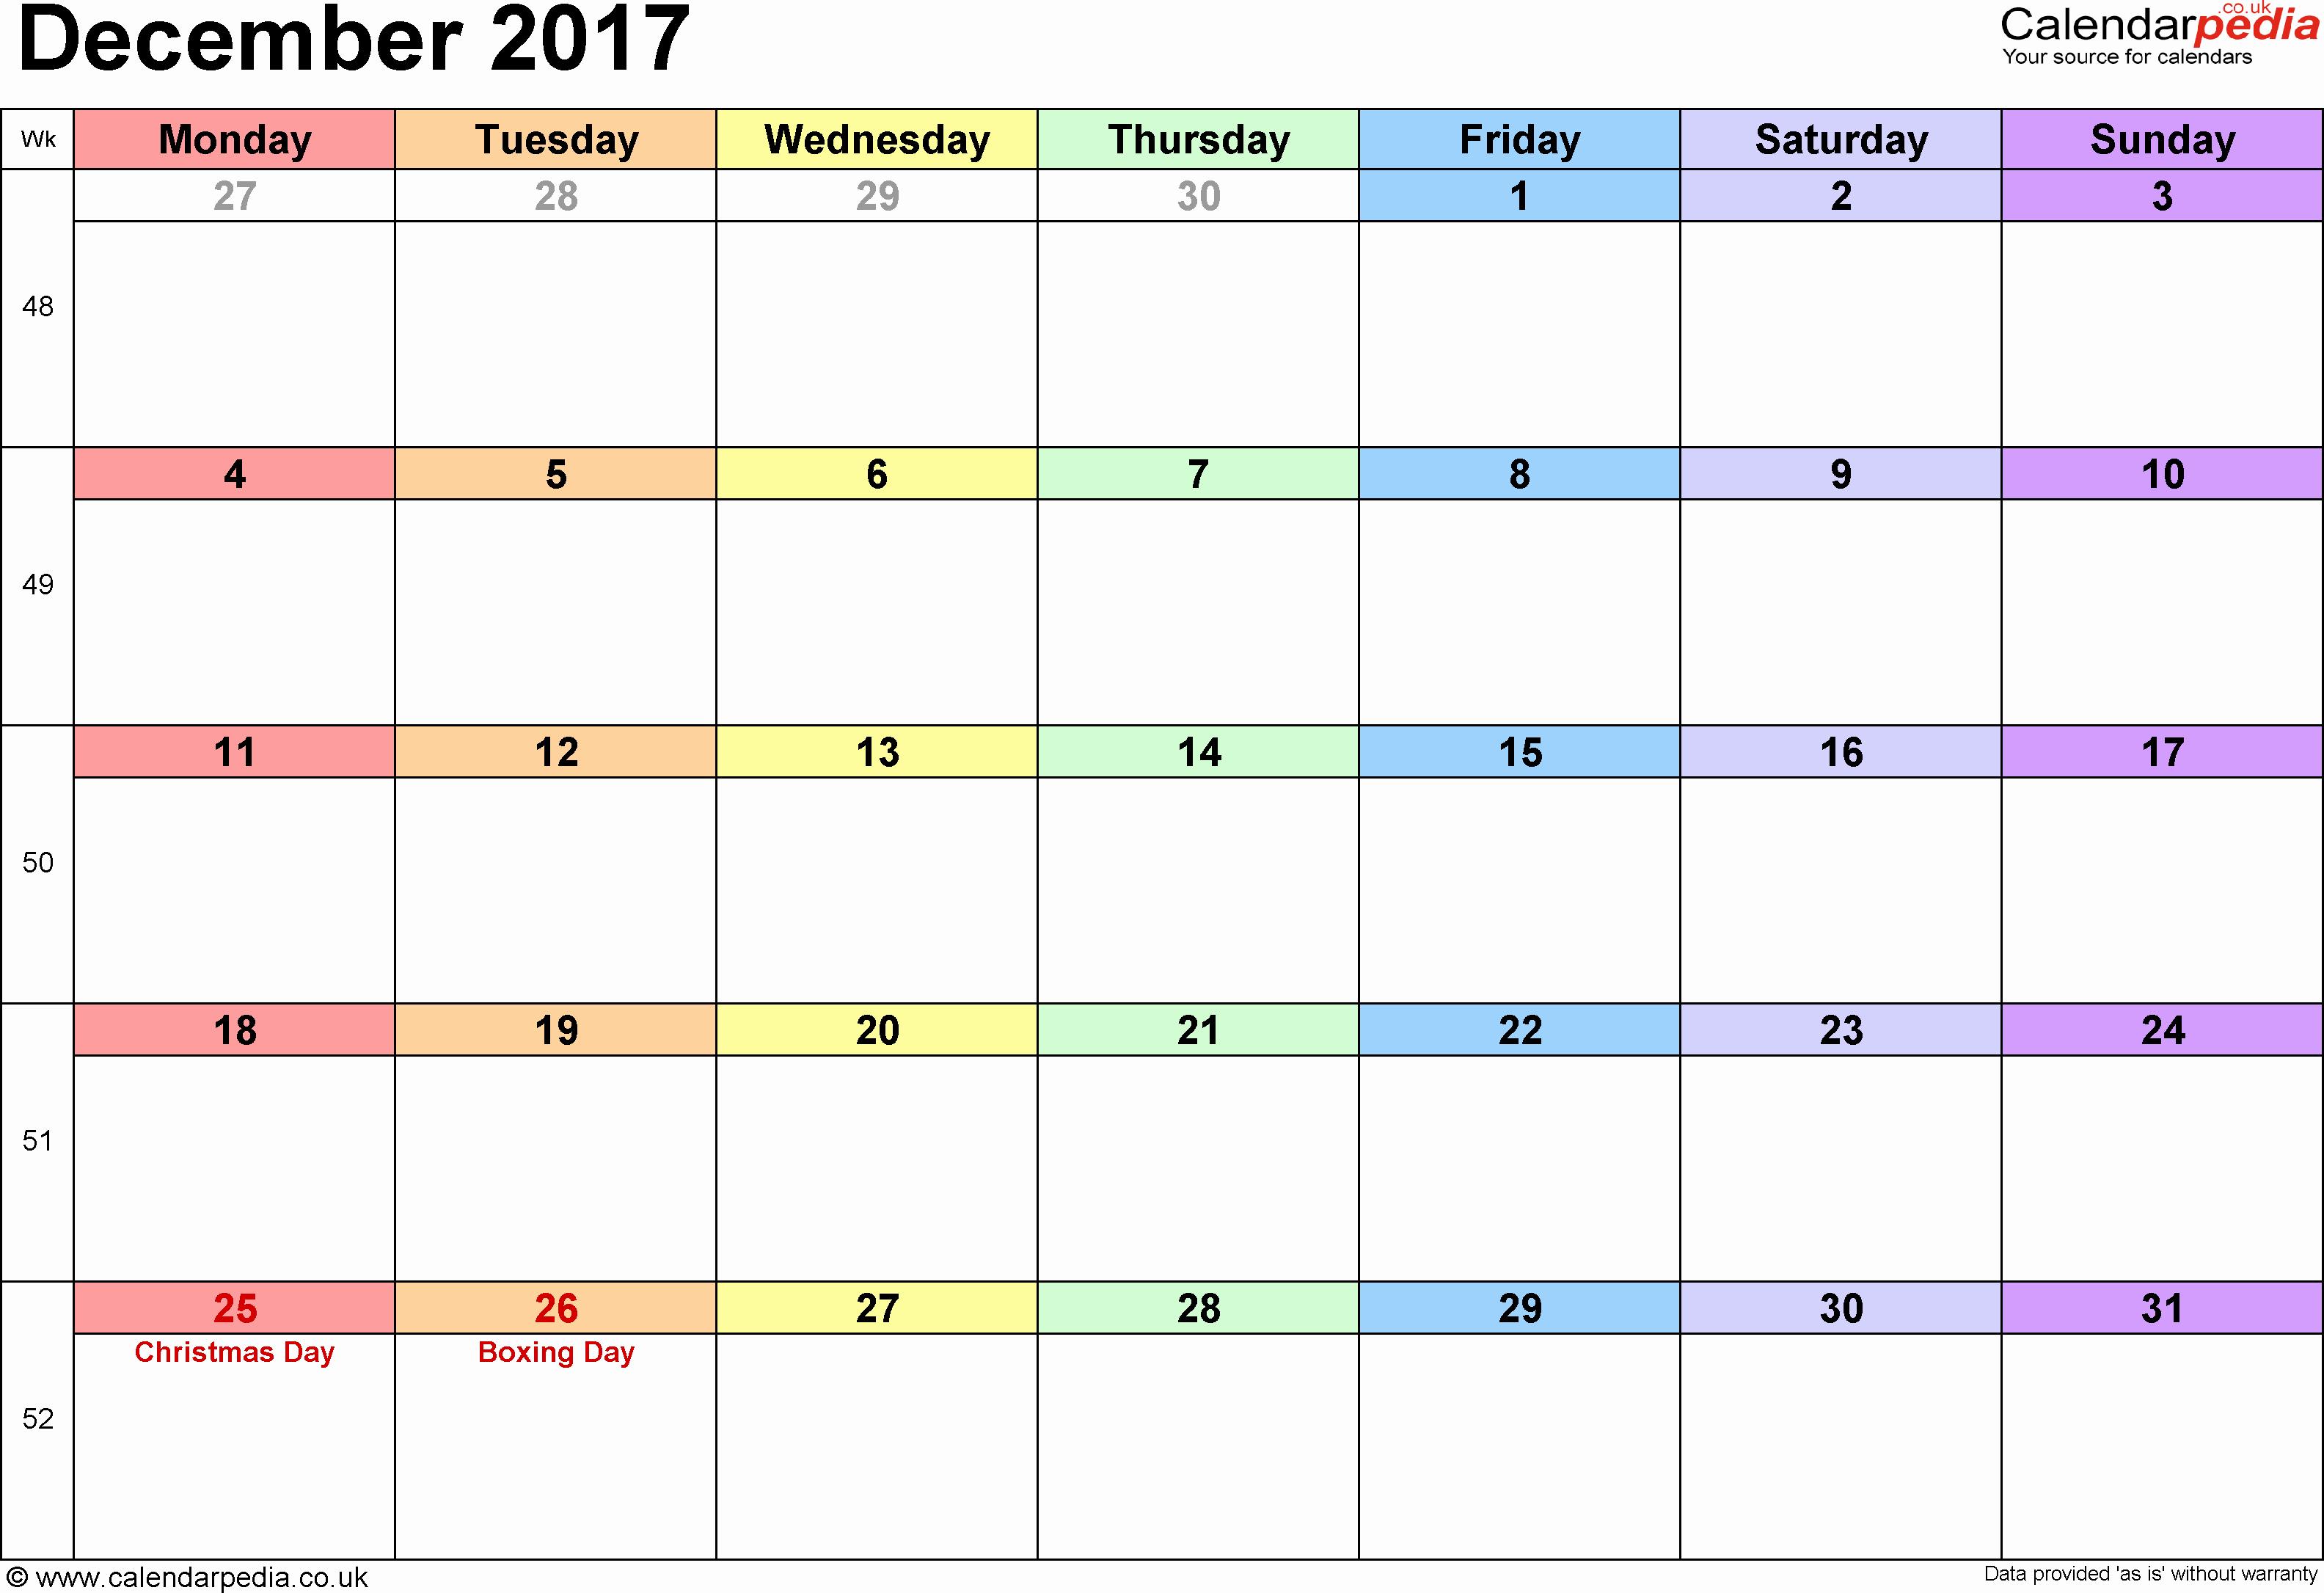 2016 Monthly Calendar Template Excel Lovely December 2017 Calendar Excel